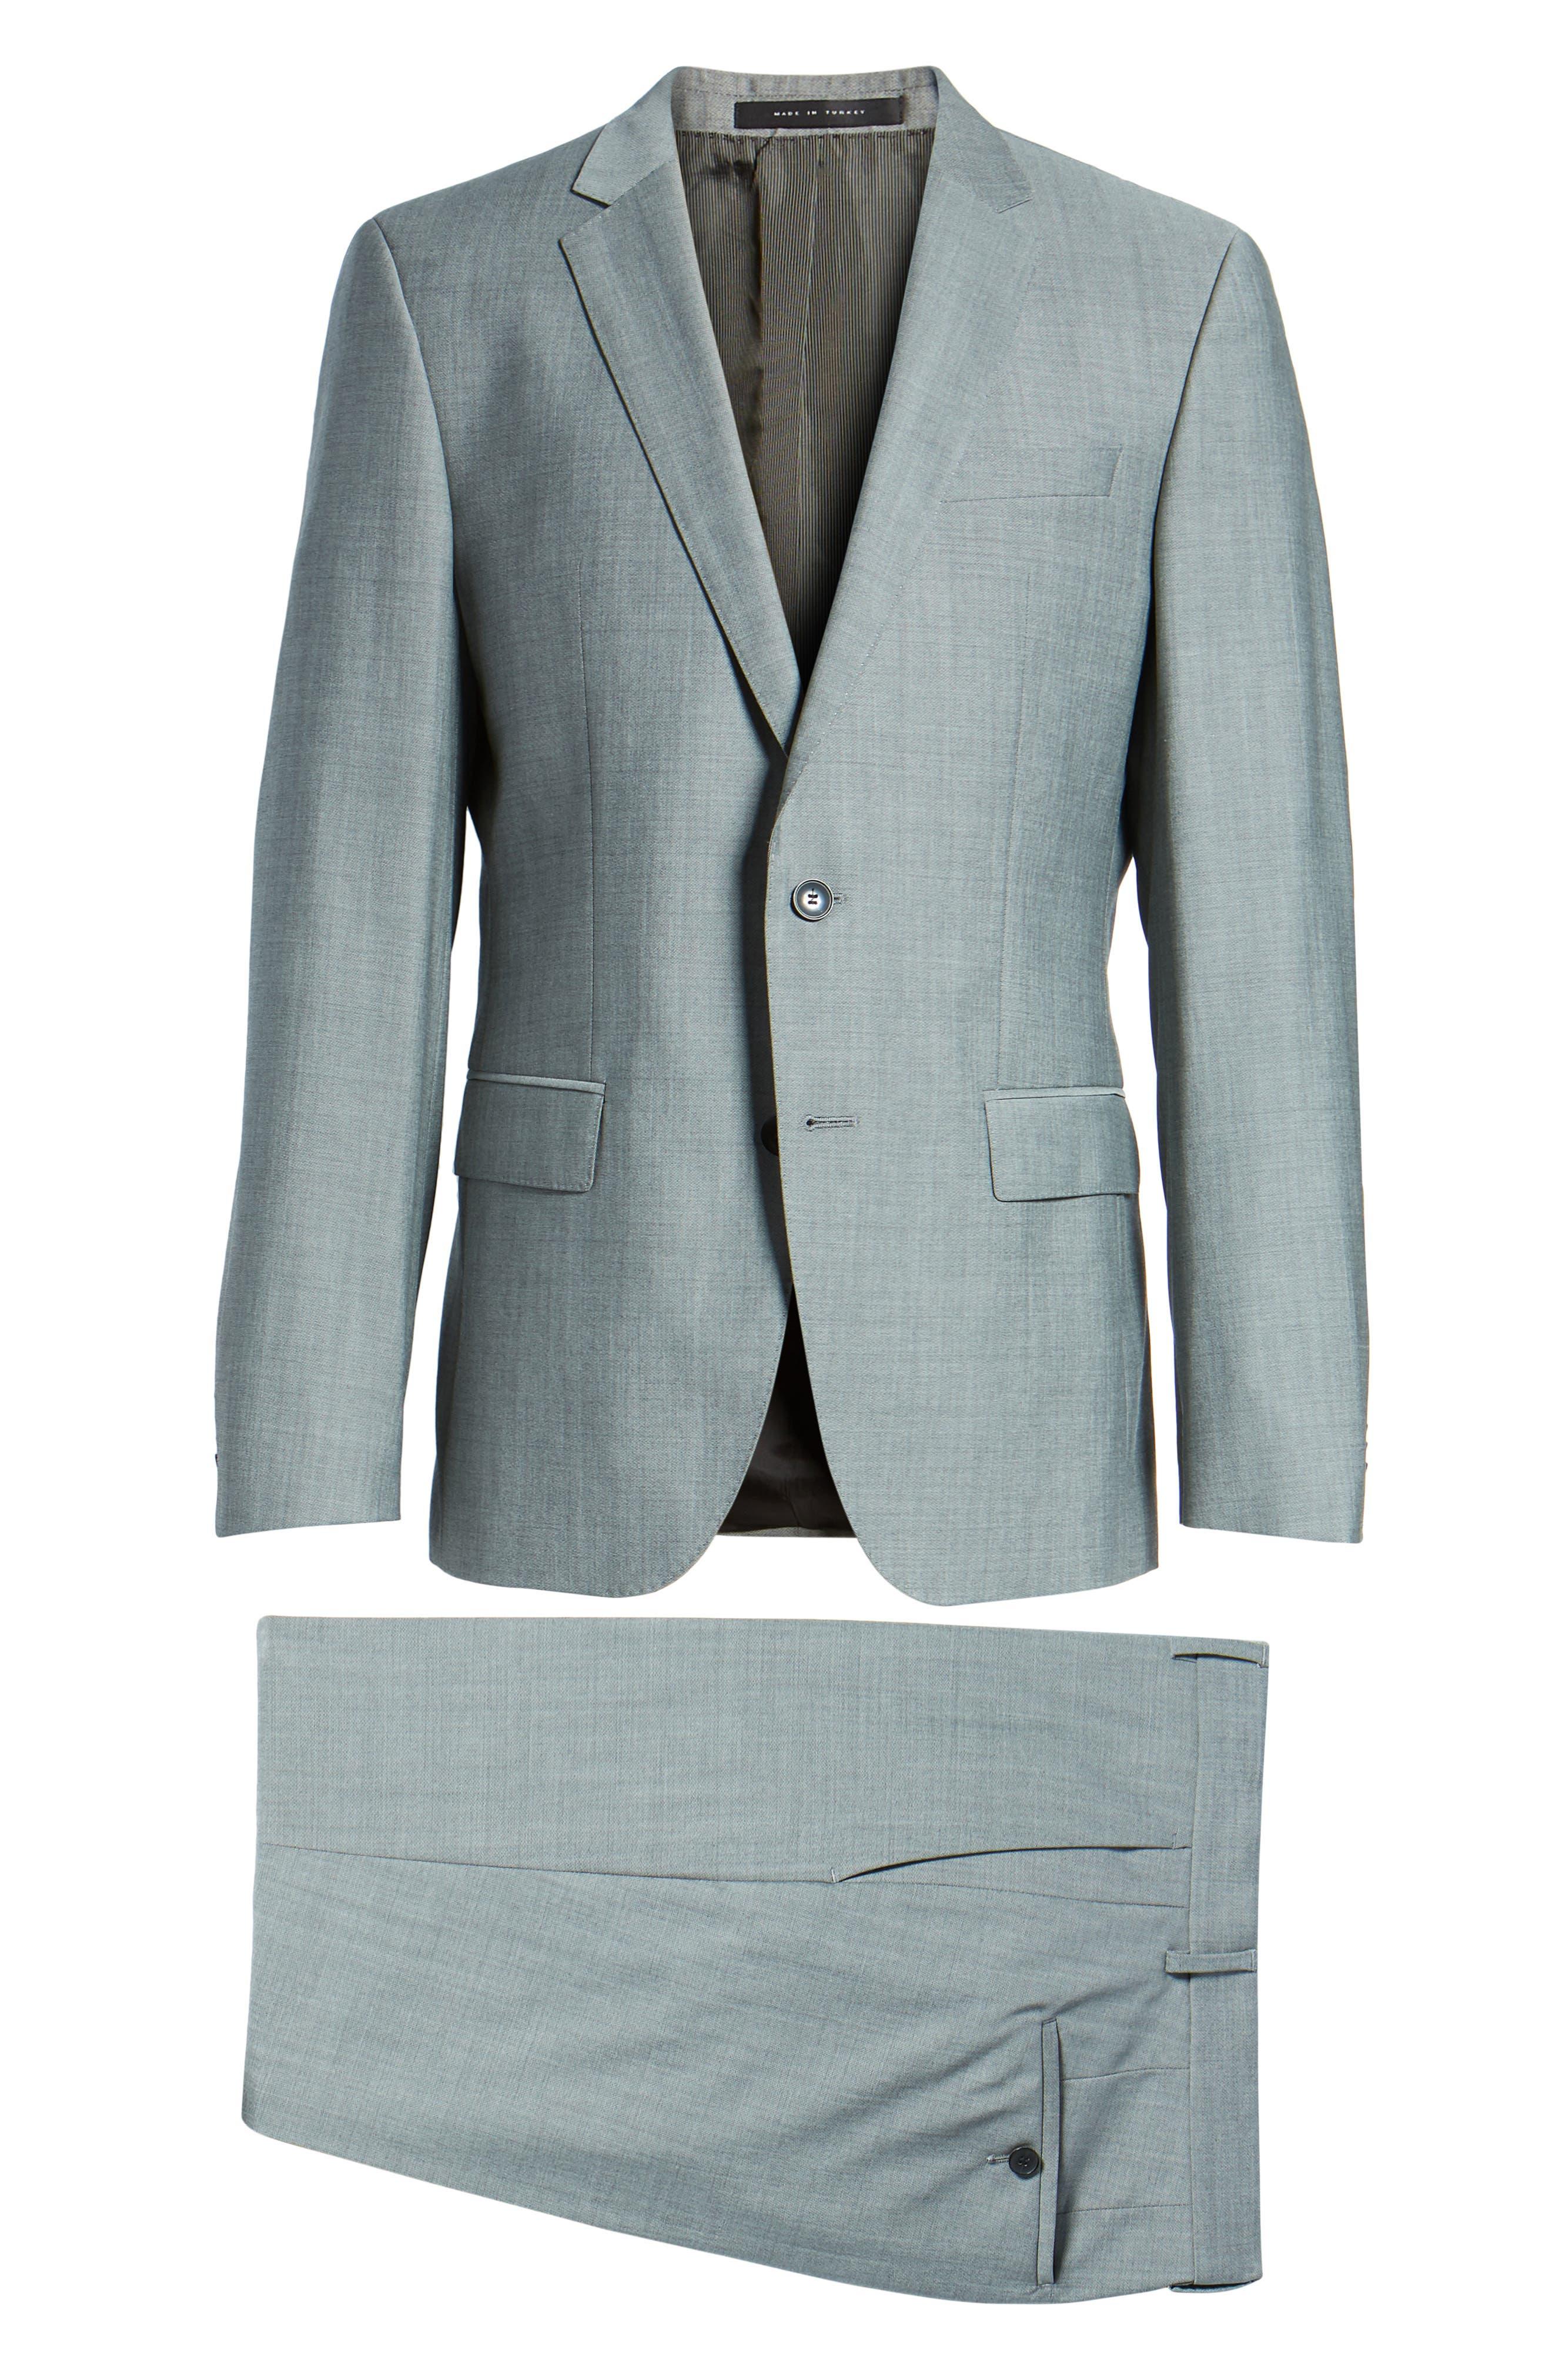 'Huge/Genius' Trim Fit Solid Wool Suit,                             Alternate thumbnail 8, color,                             PEARL GREY